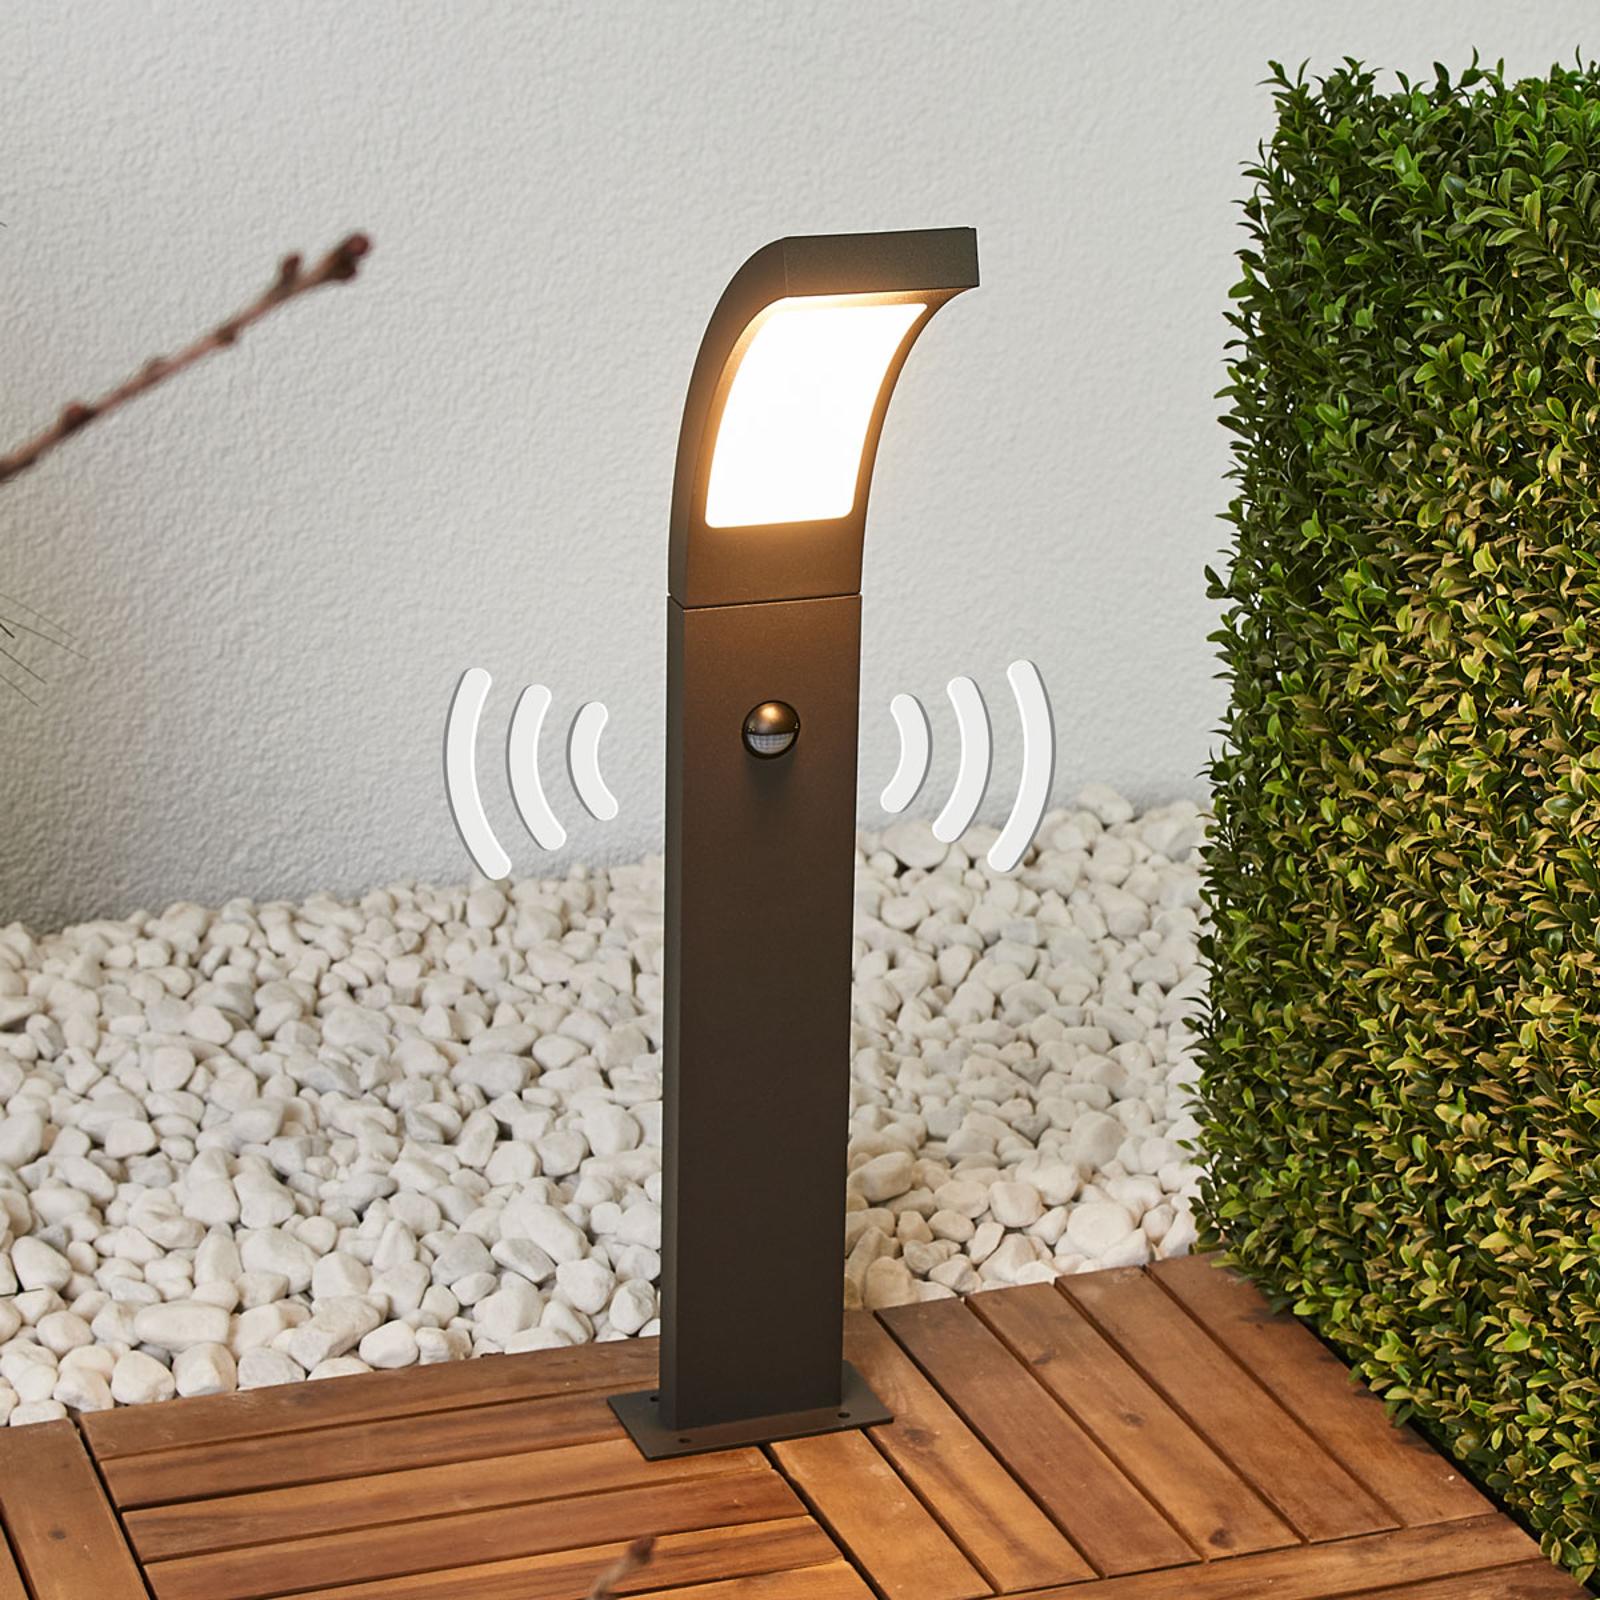 Sensorstyrt veilampe Juvia med LED-lys